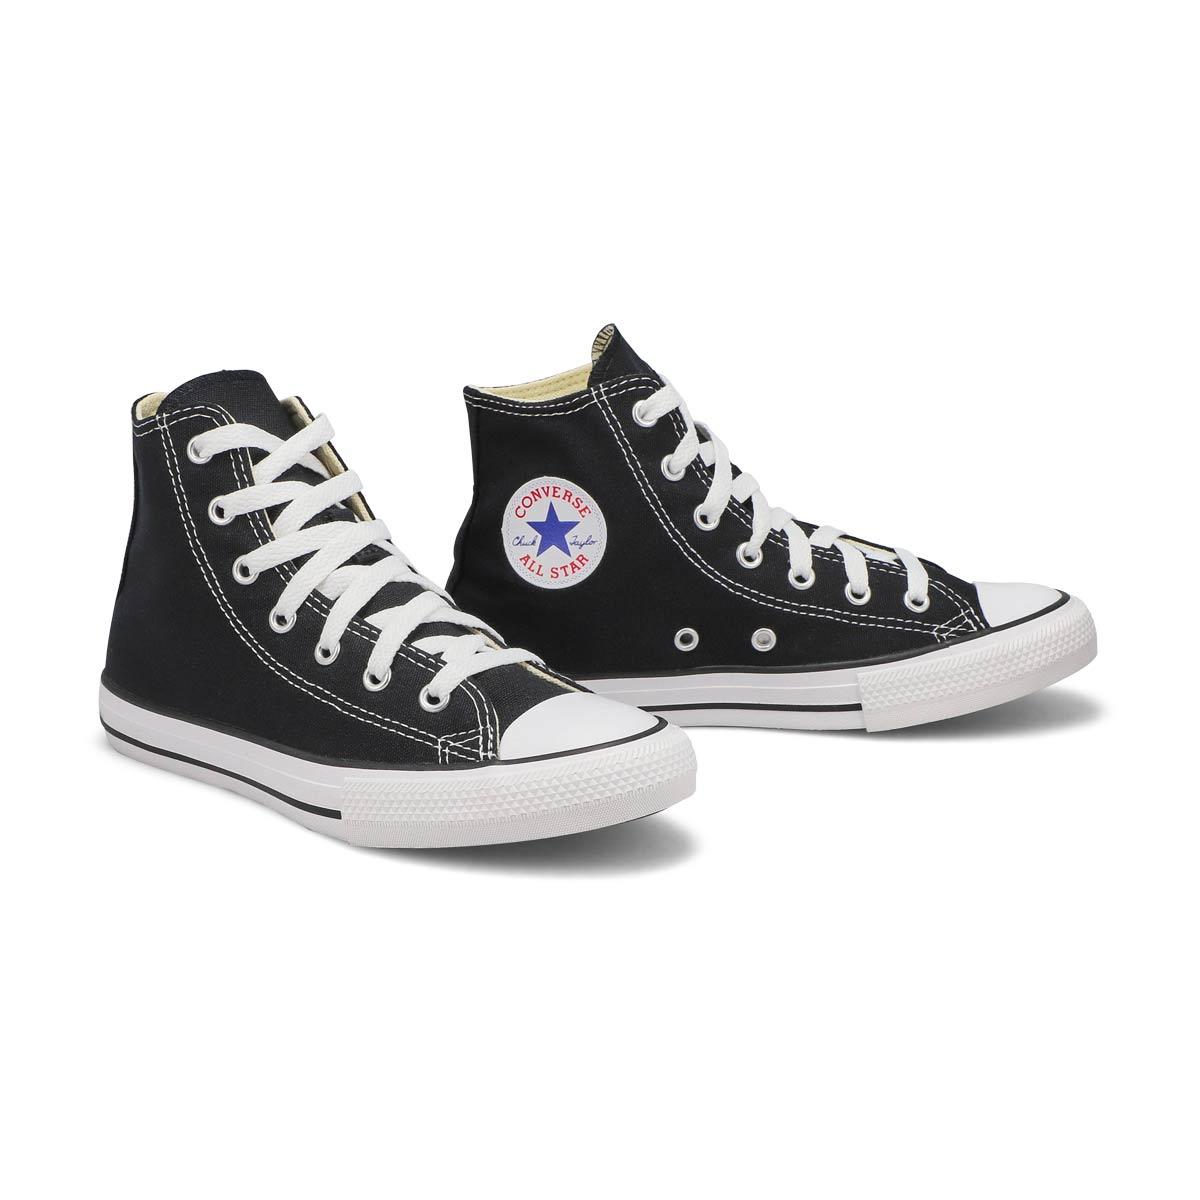 Kds CTAS Core black high cut sneaker